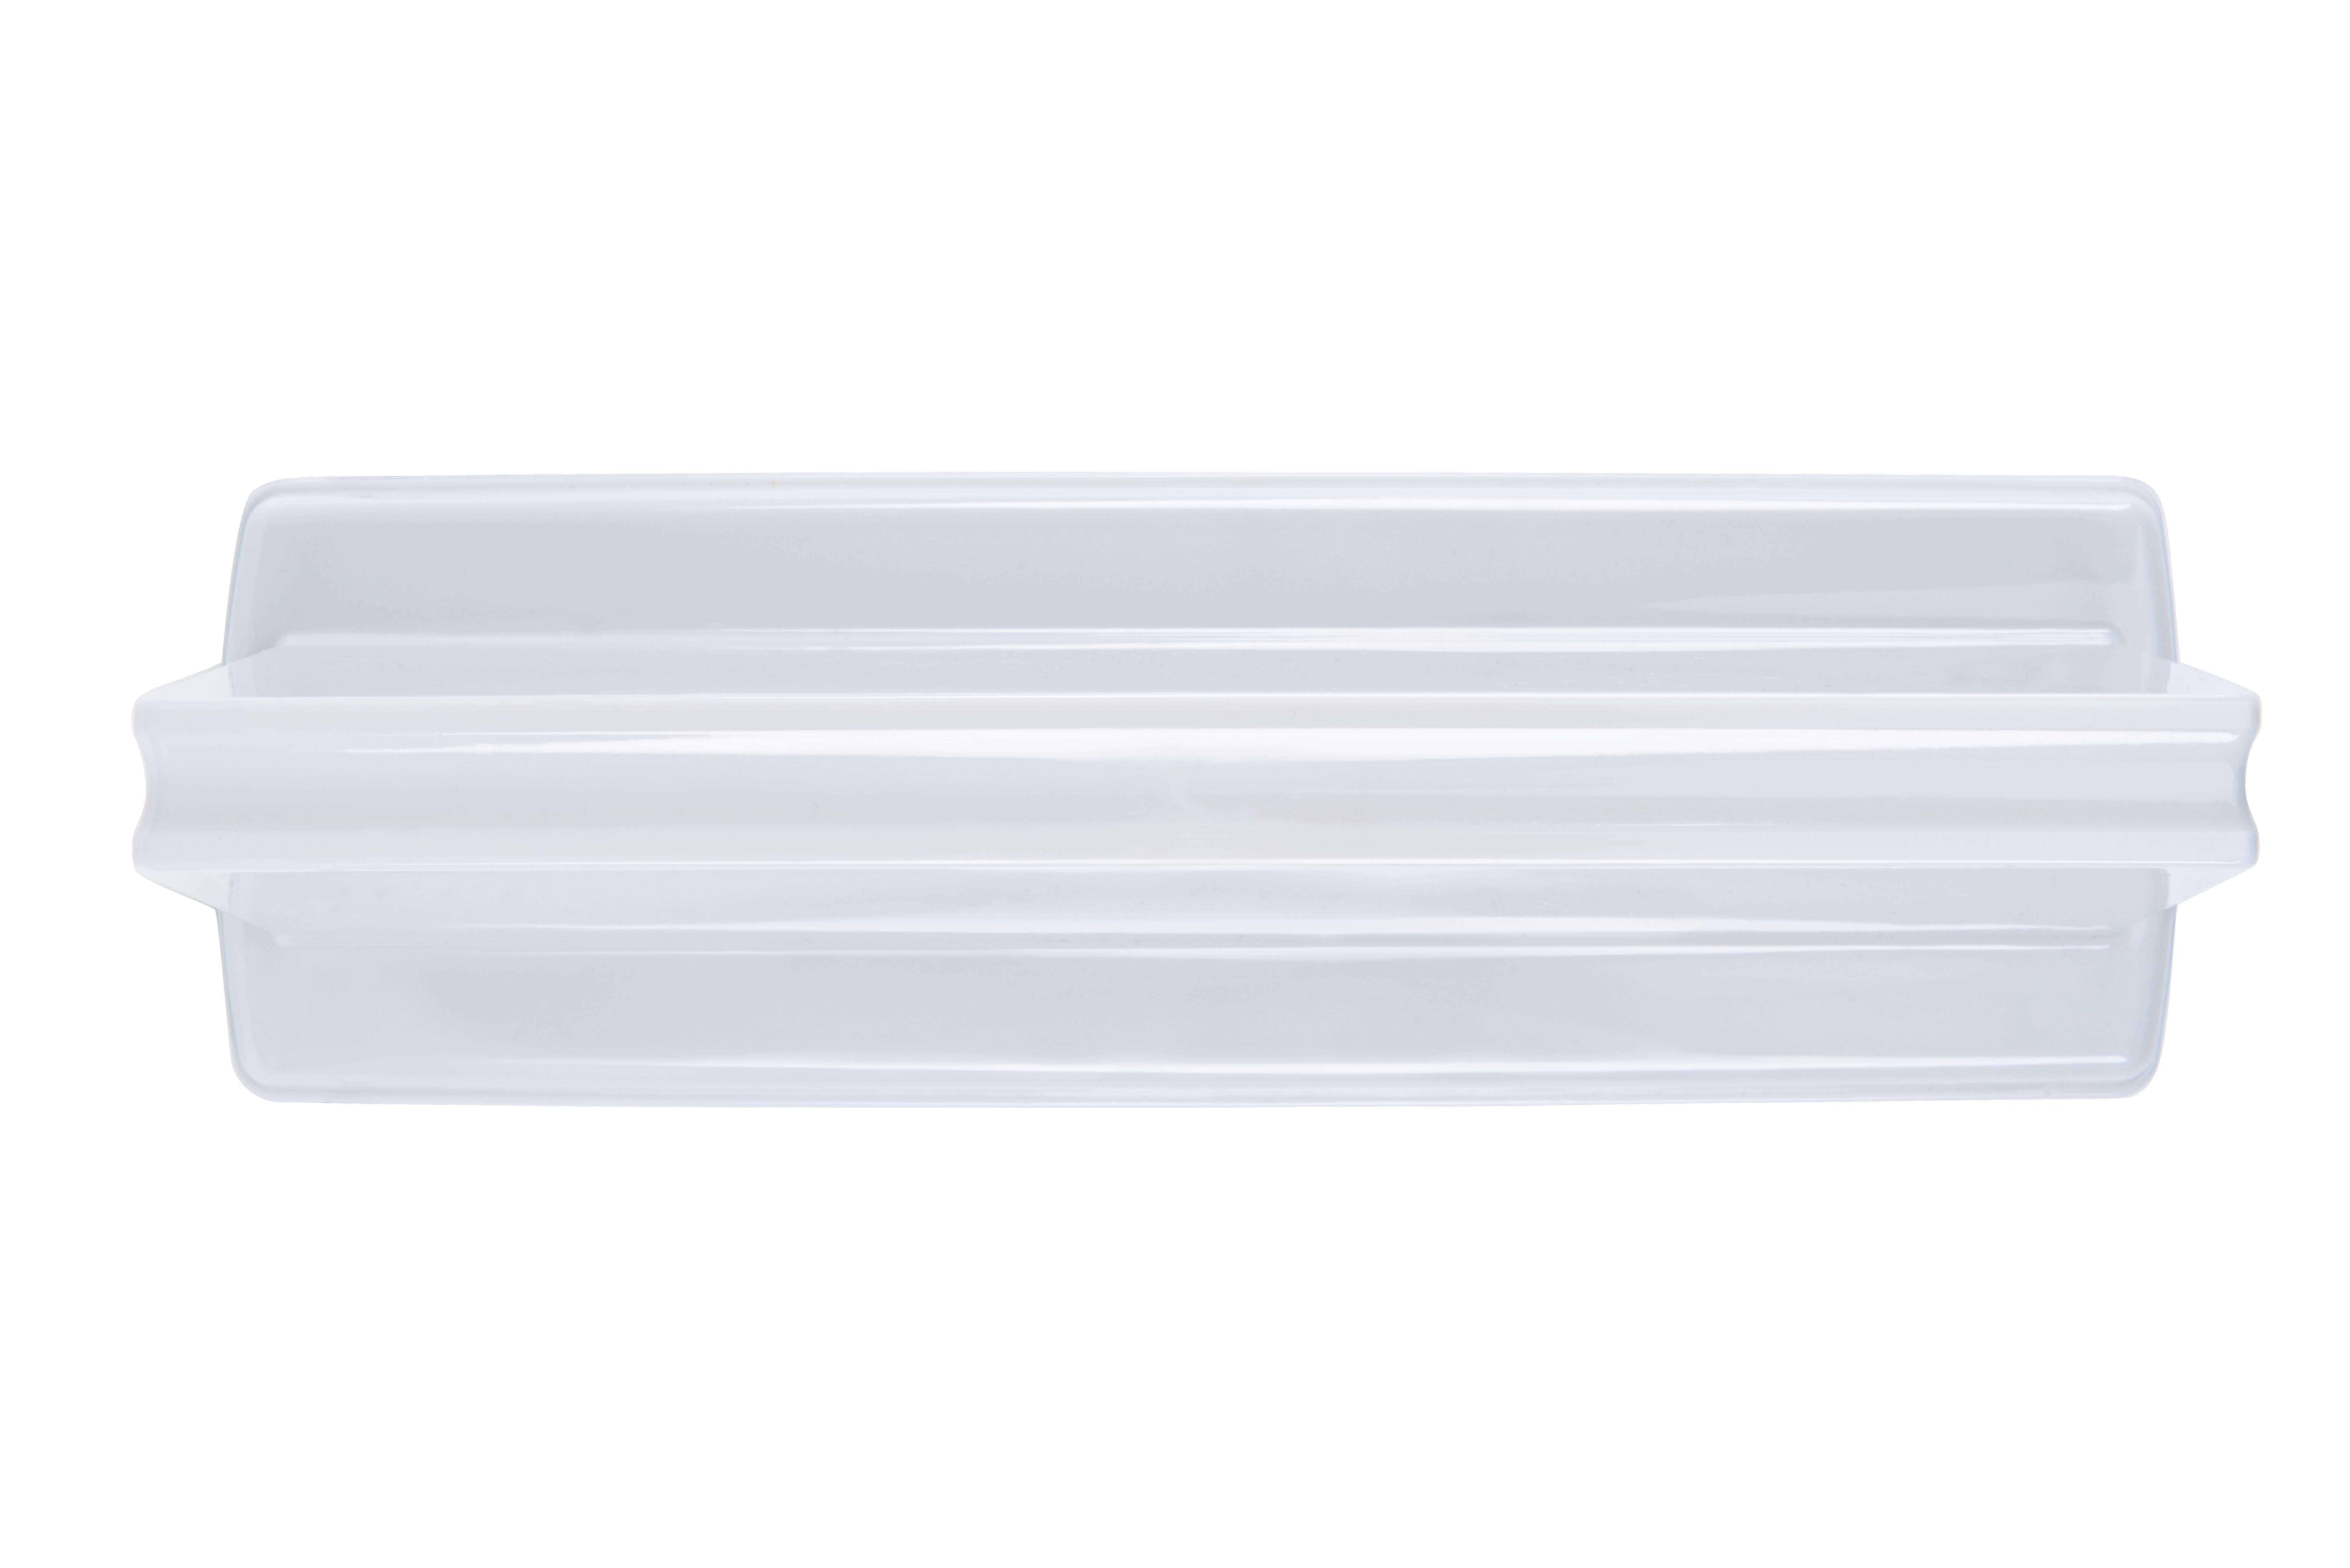 Lampa emergenta led Intelight 97245   3h mentinut/nementinut test automat3